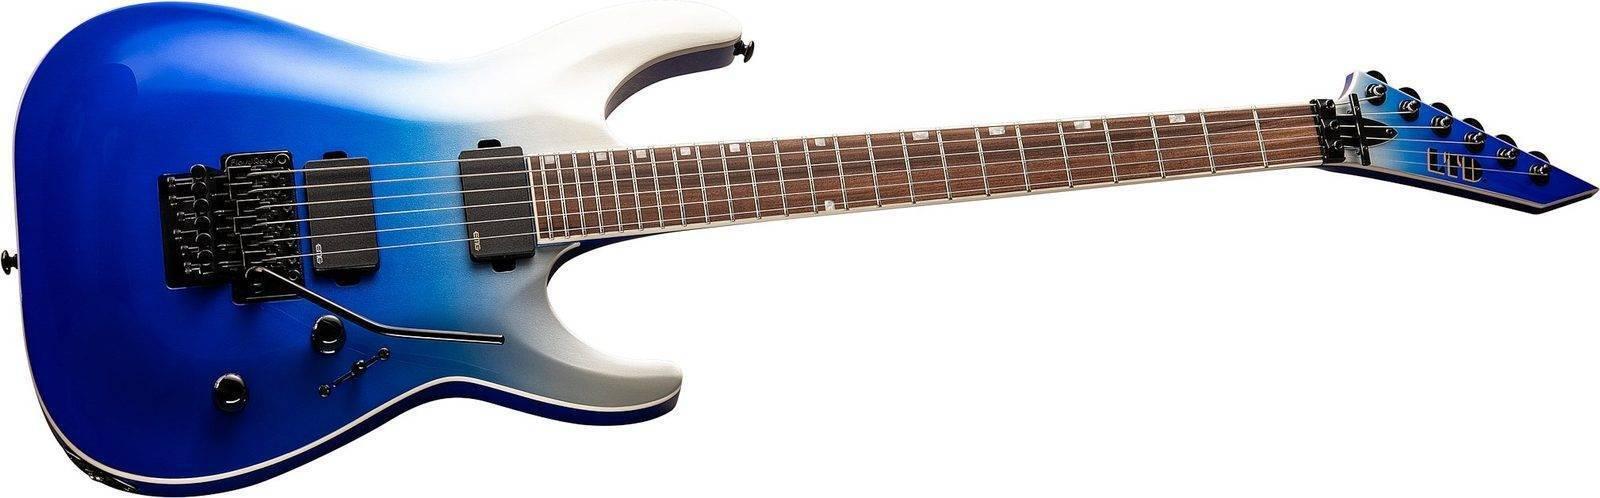 Guitarra LTD MH-400FR BLUE PEARL FADE METALLIC